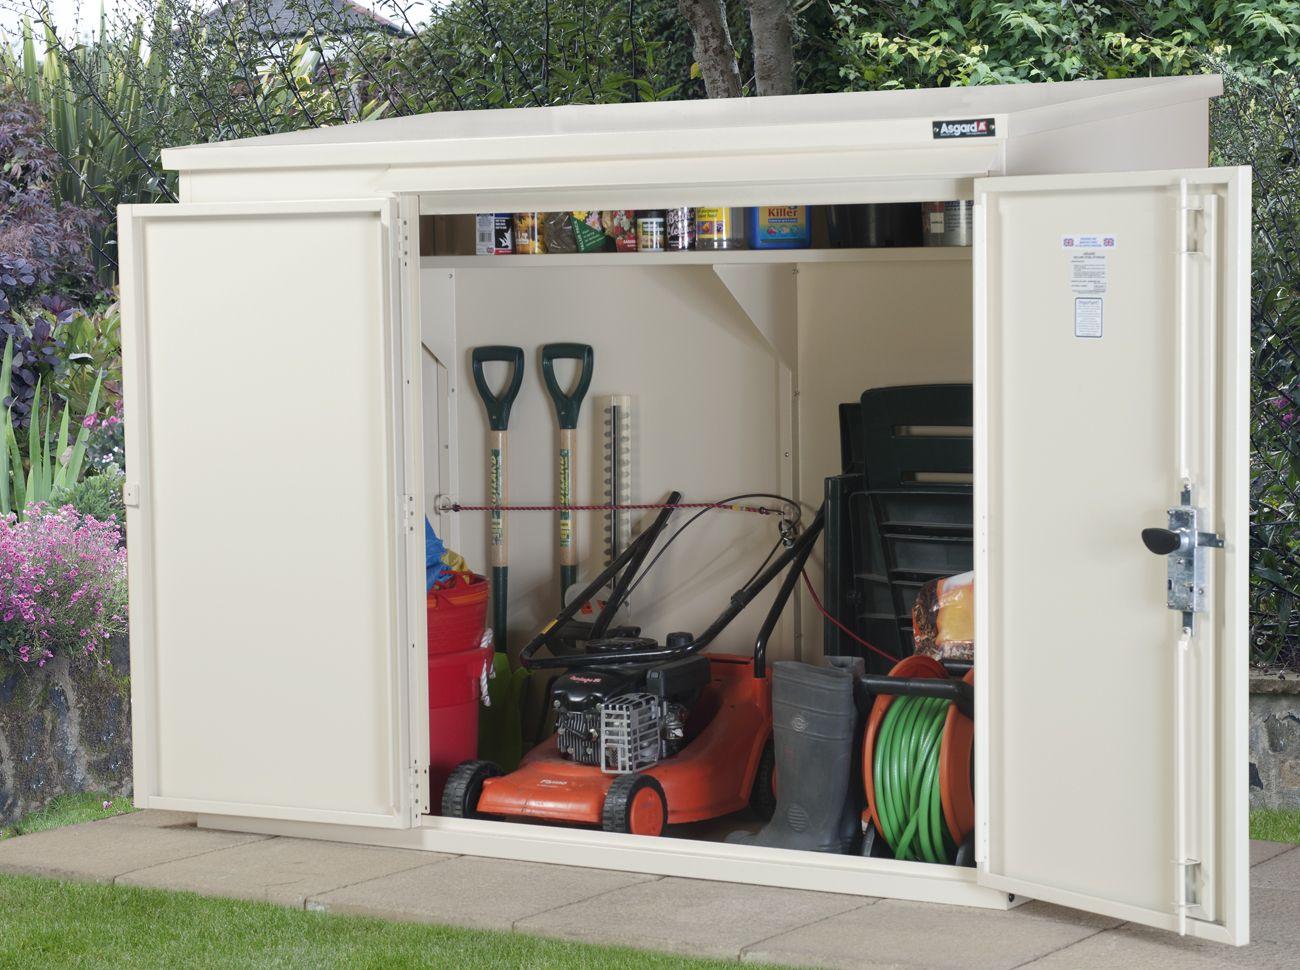 6x3 Caravan Site Storage S Outdoor Storage Units Suncast Storage Shed Outdoor Toy Storage